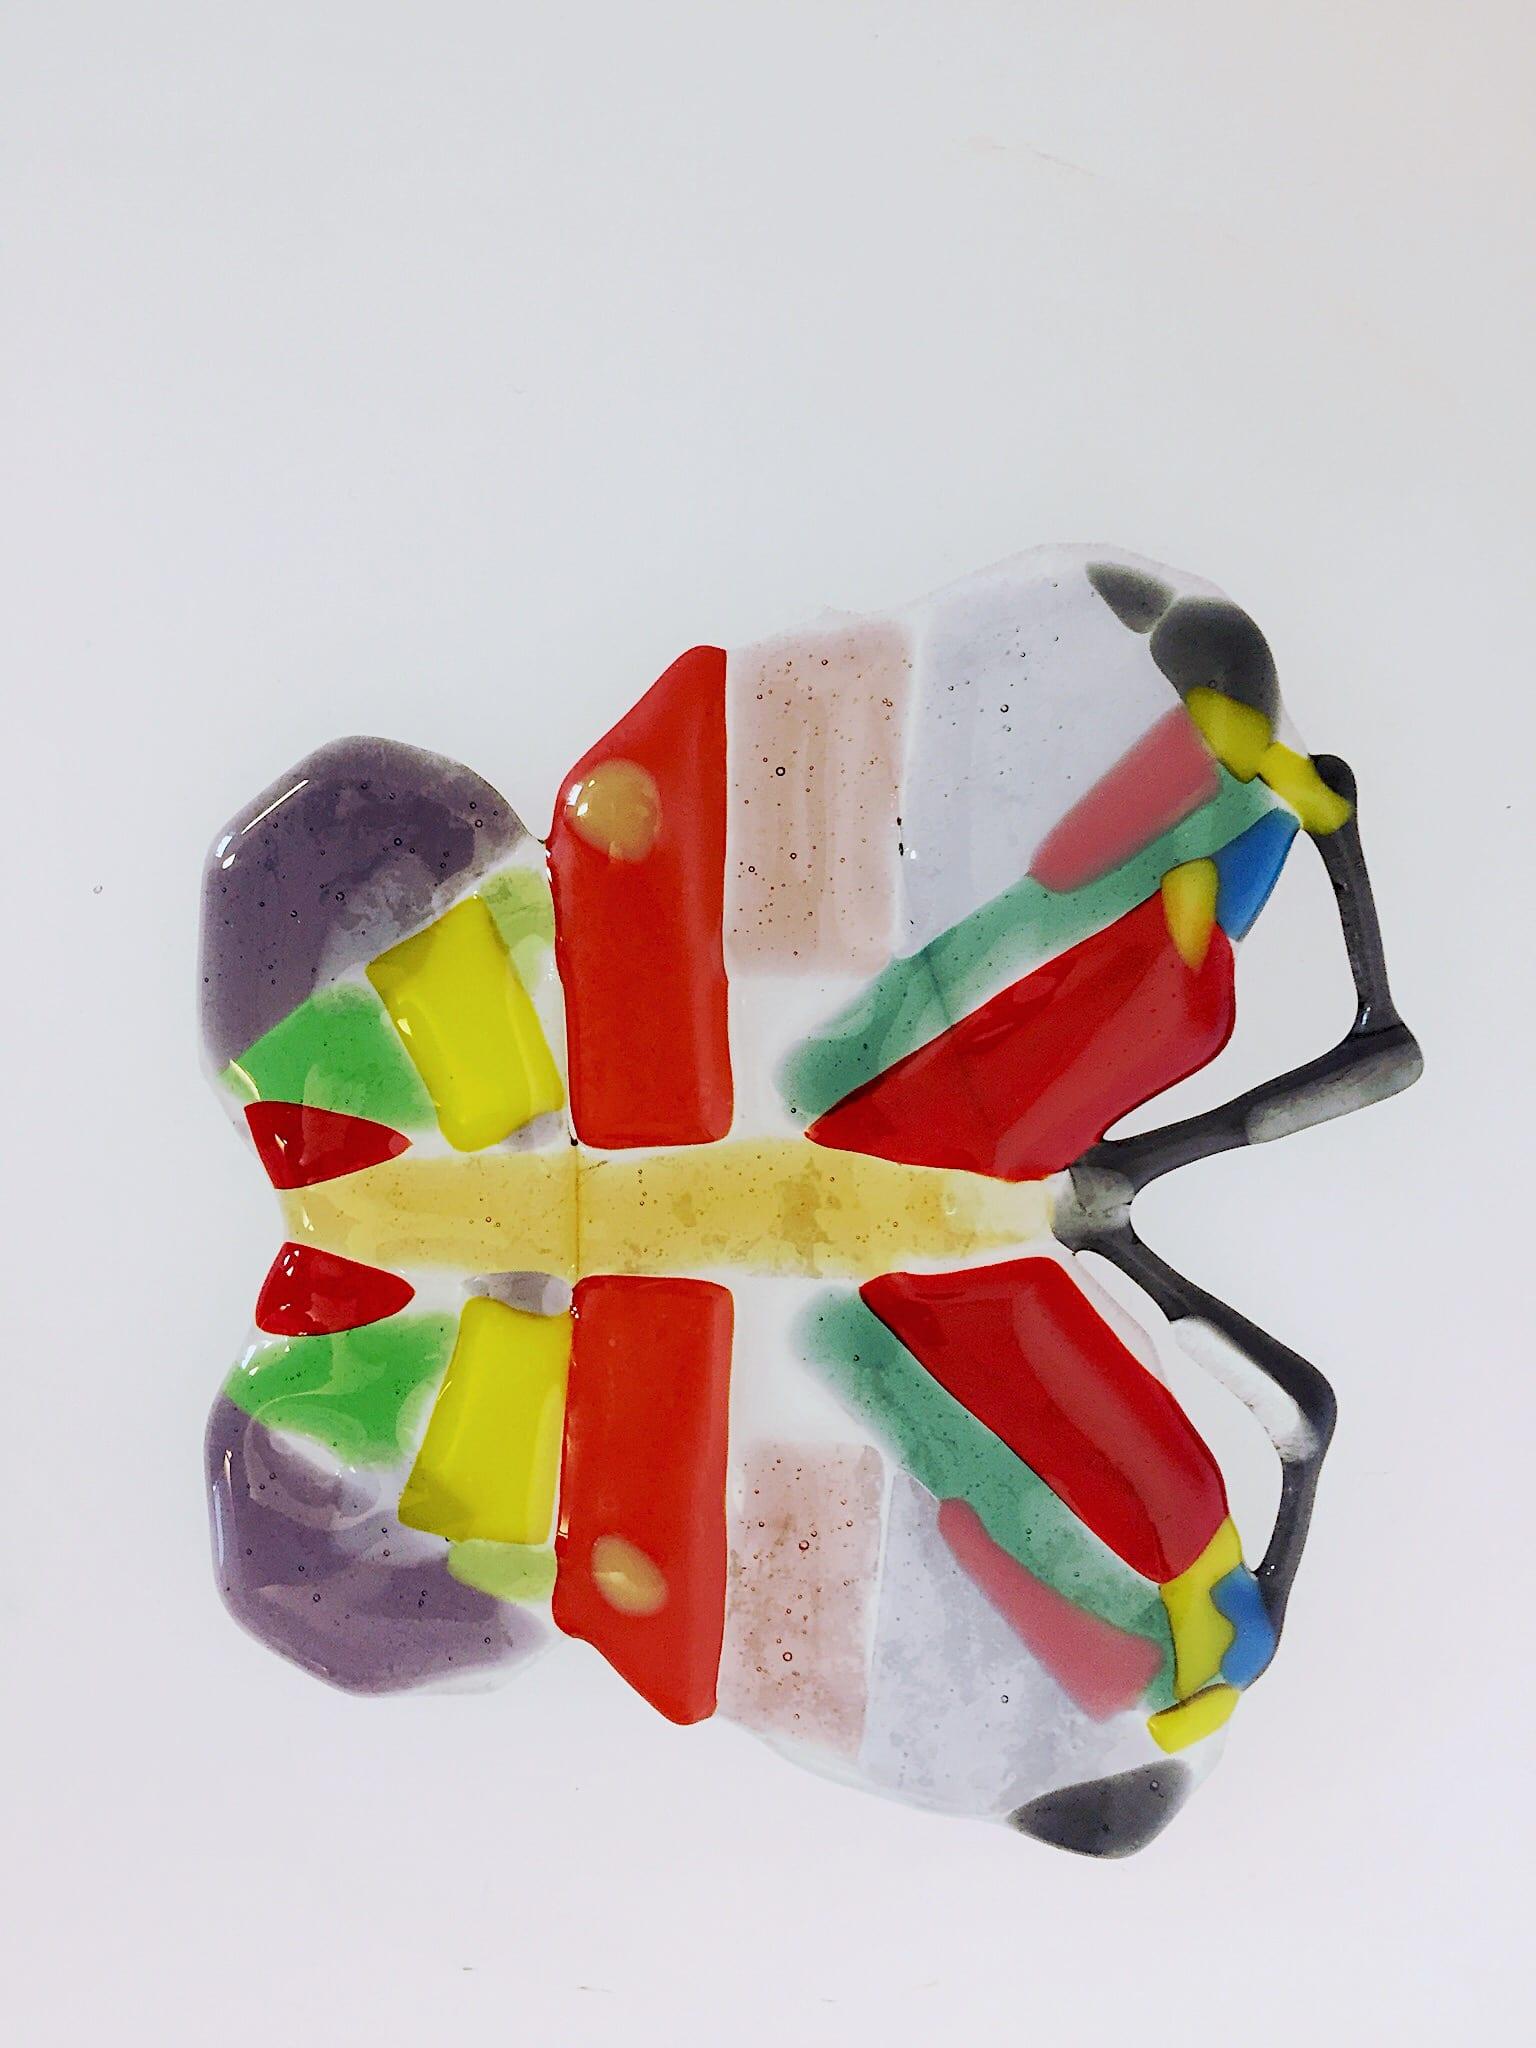 Butterfly glass decoration workshop. Glass Point